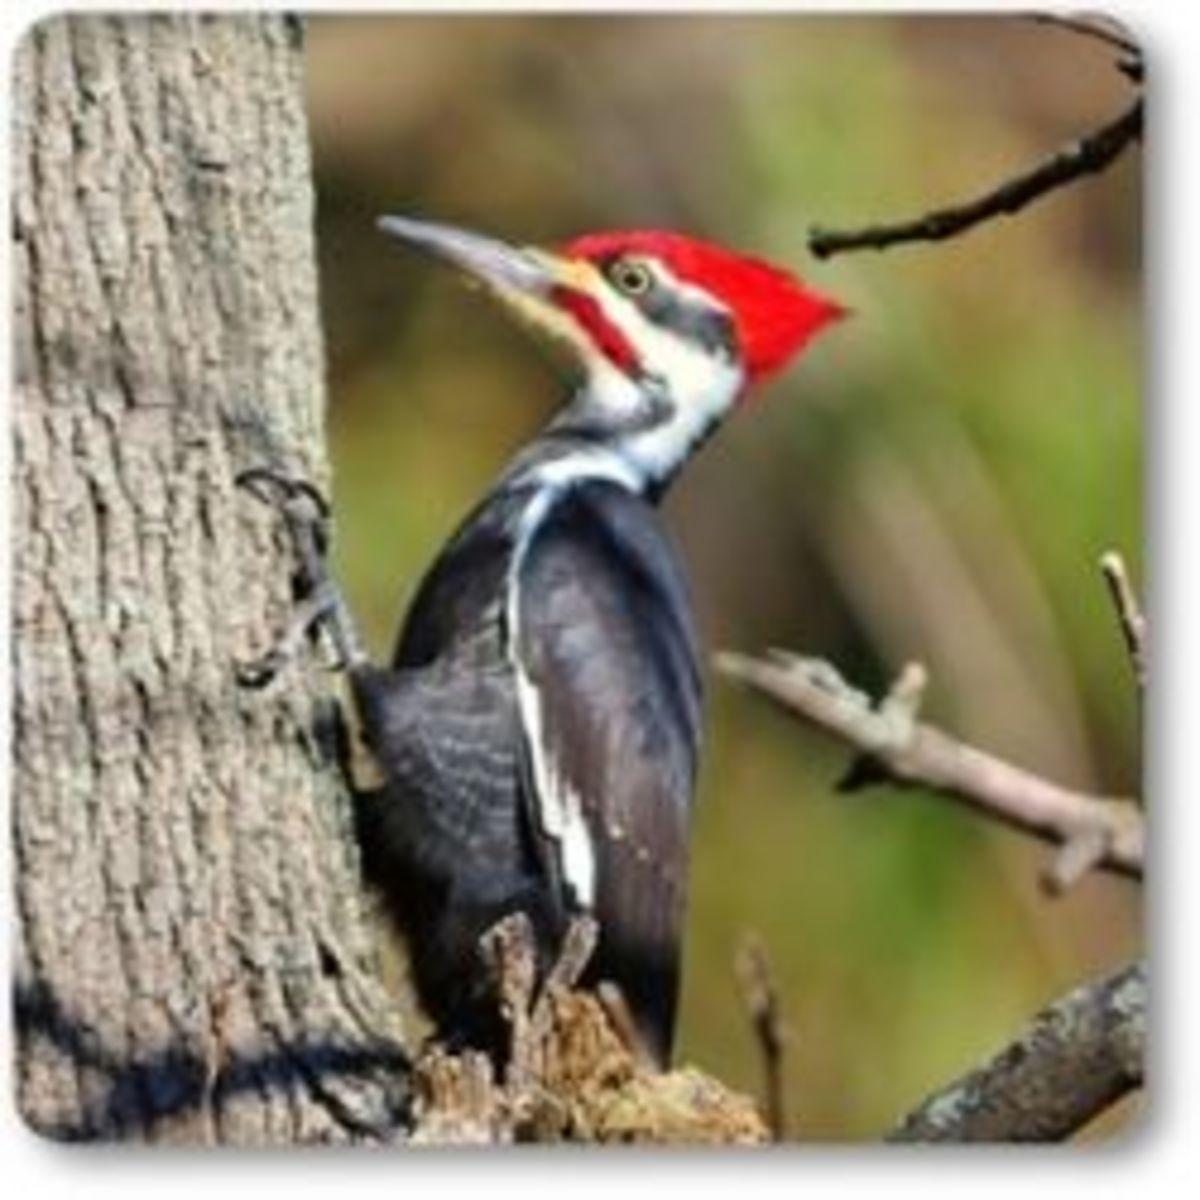 The Woodpecker bird